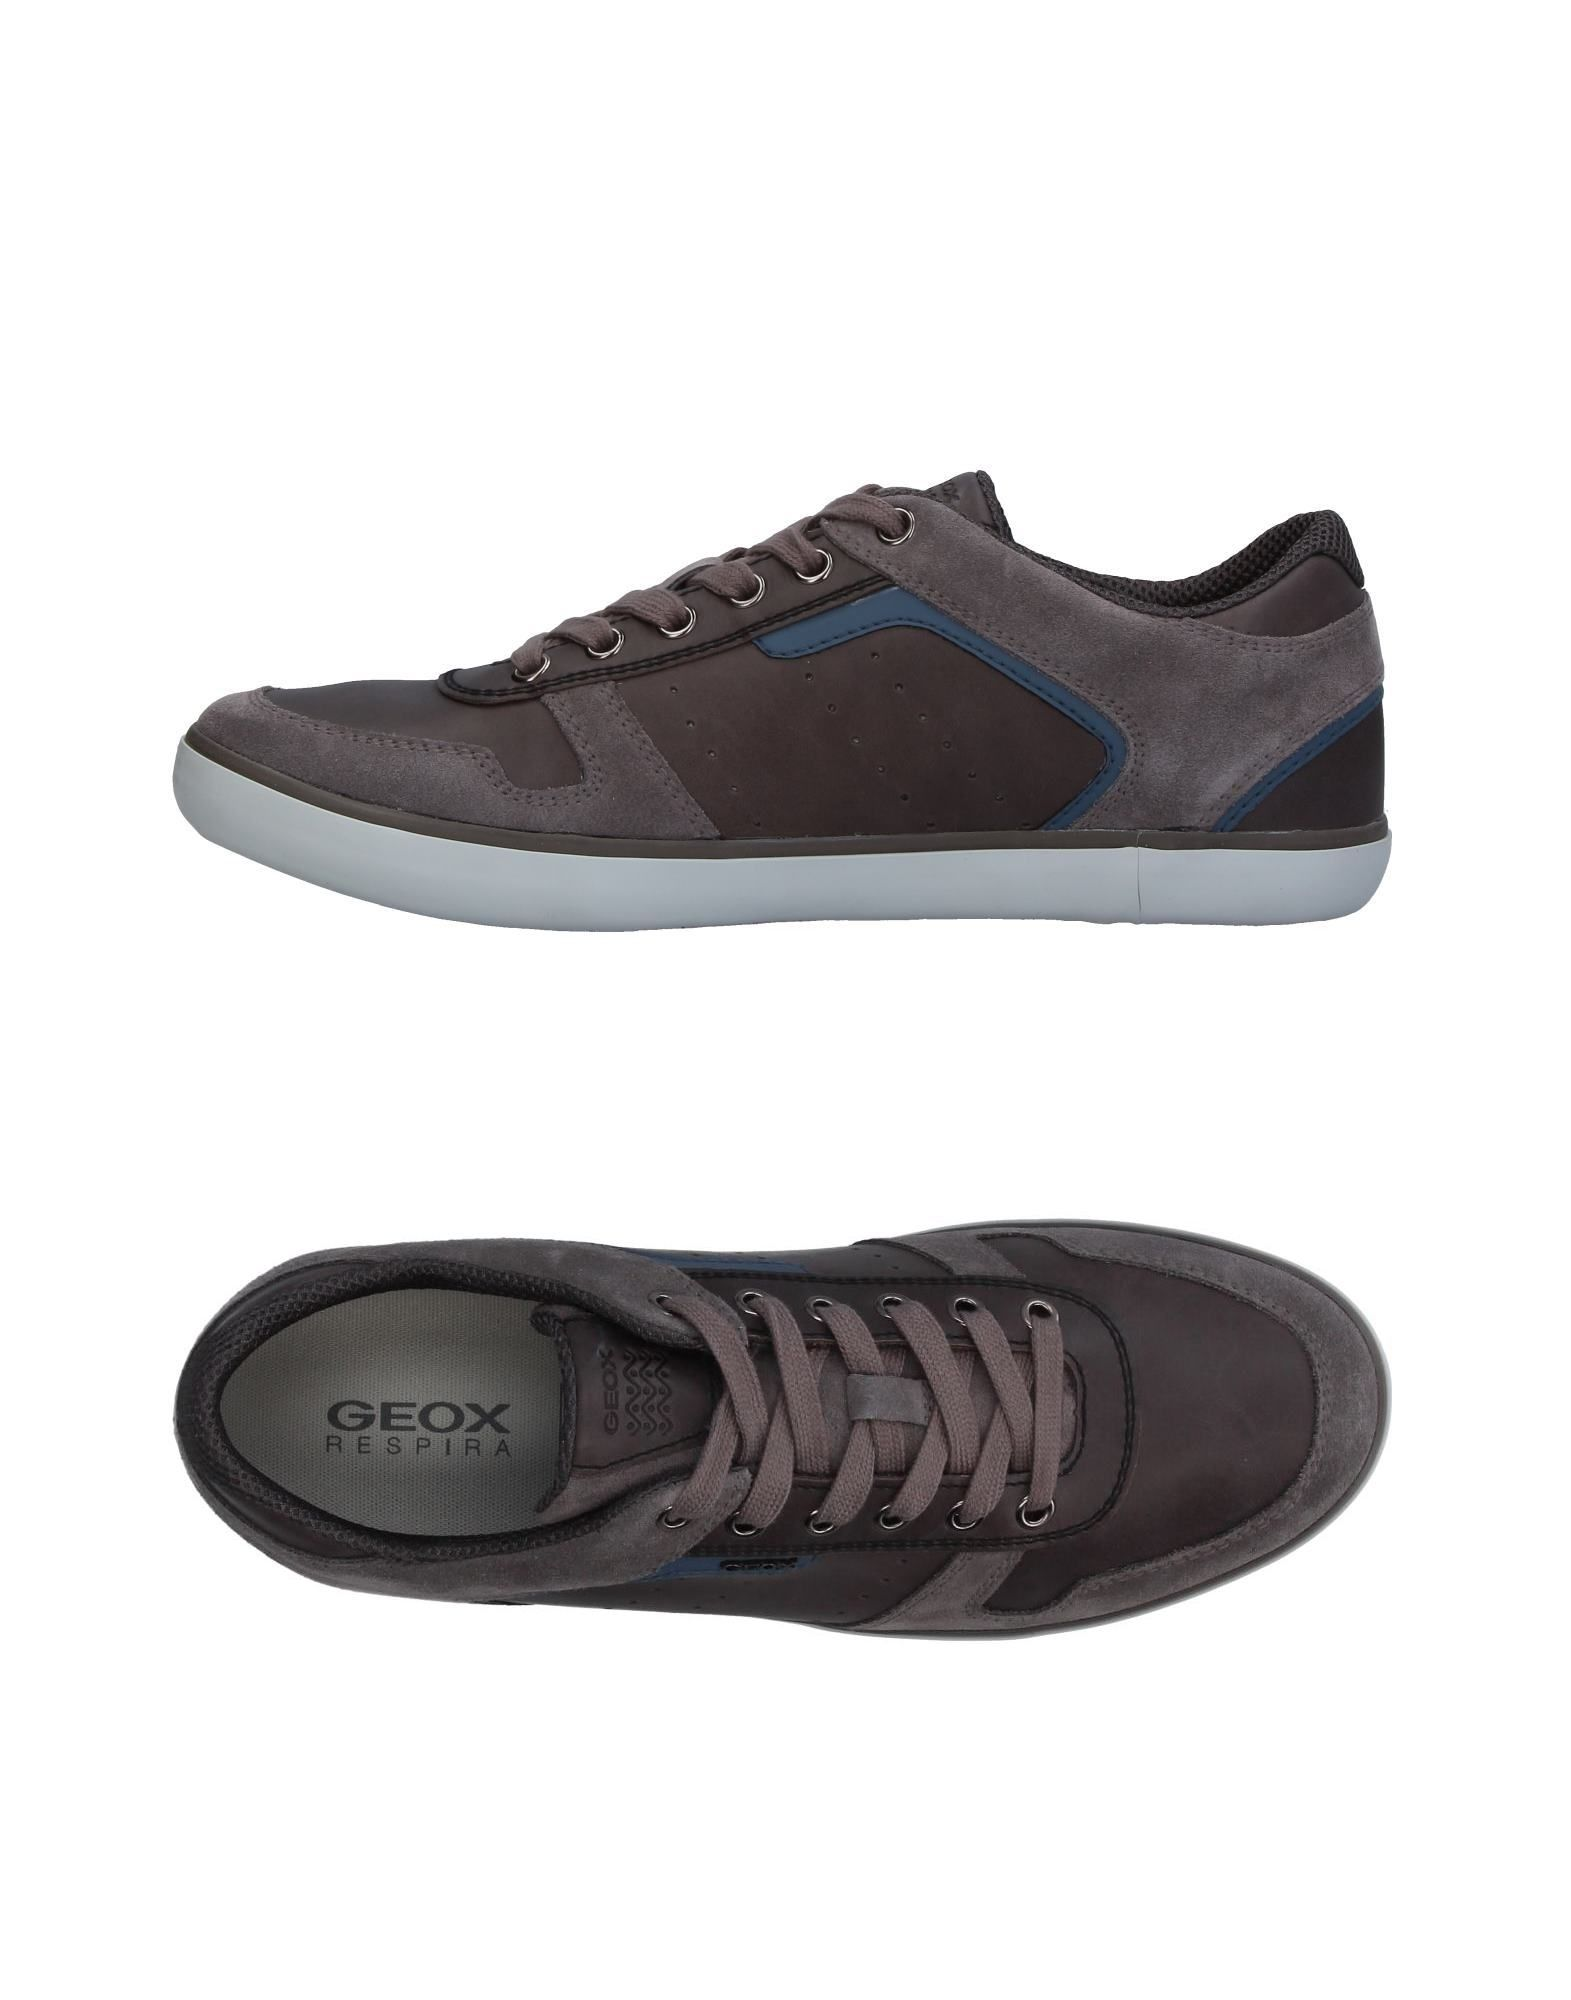 Sneakers Geox Homme - Sneakers Geox  Plomb Mode pas cher et belle